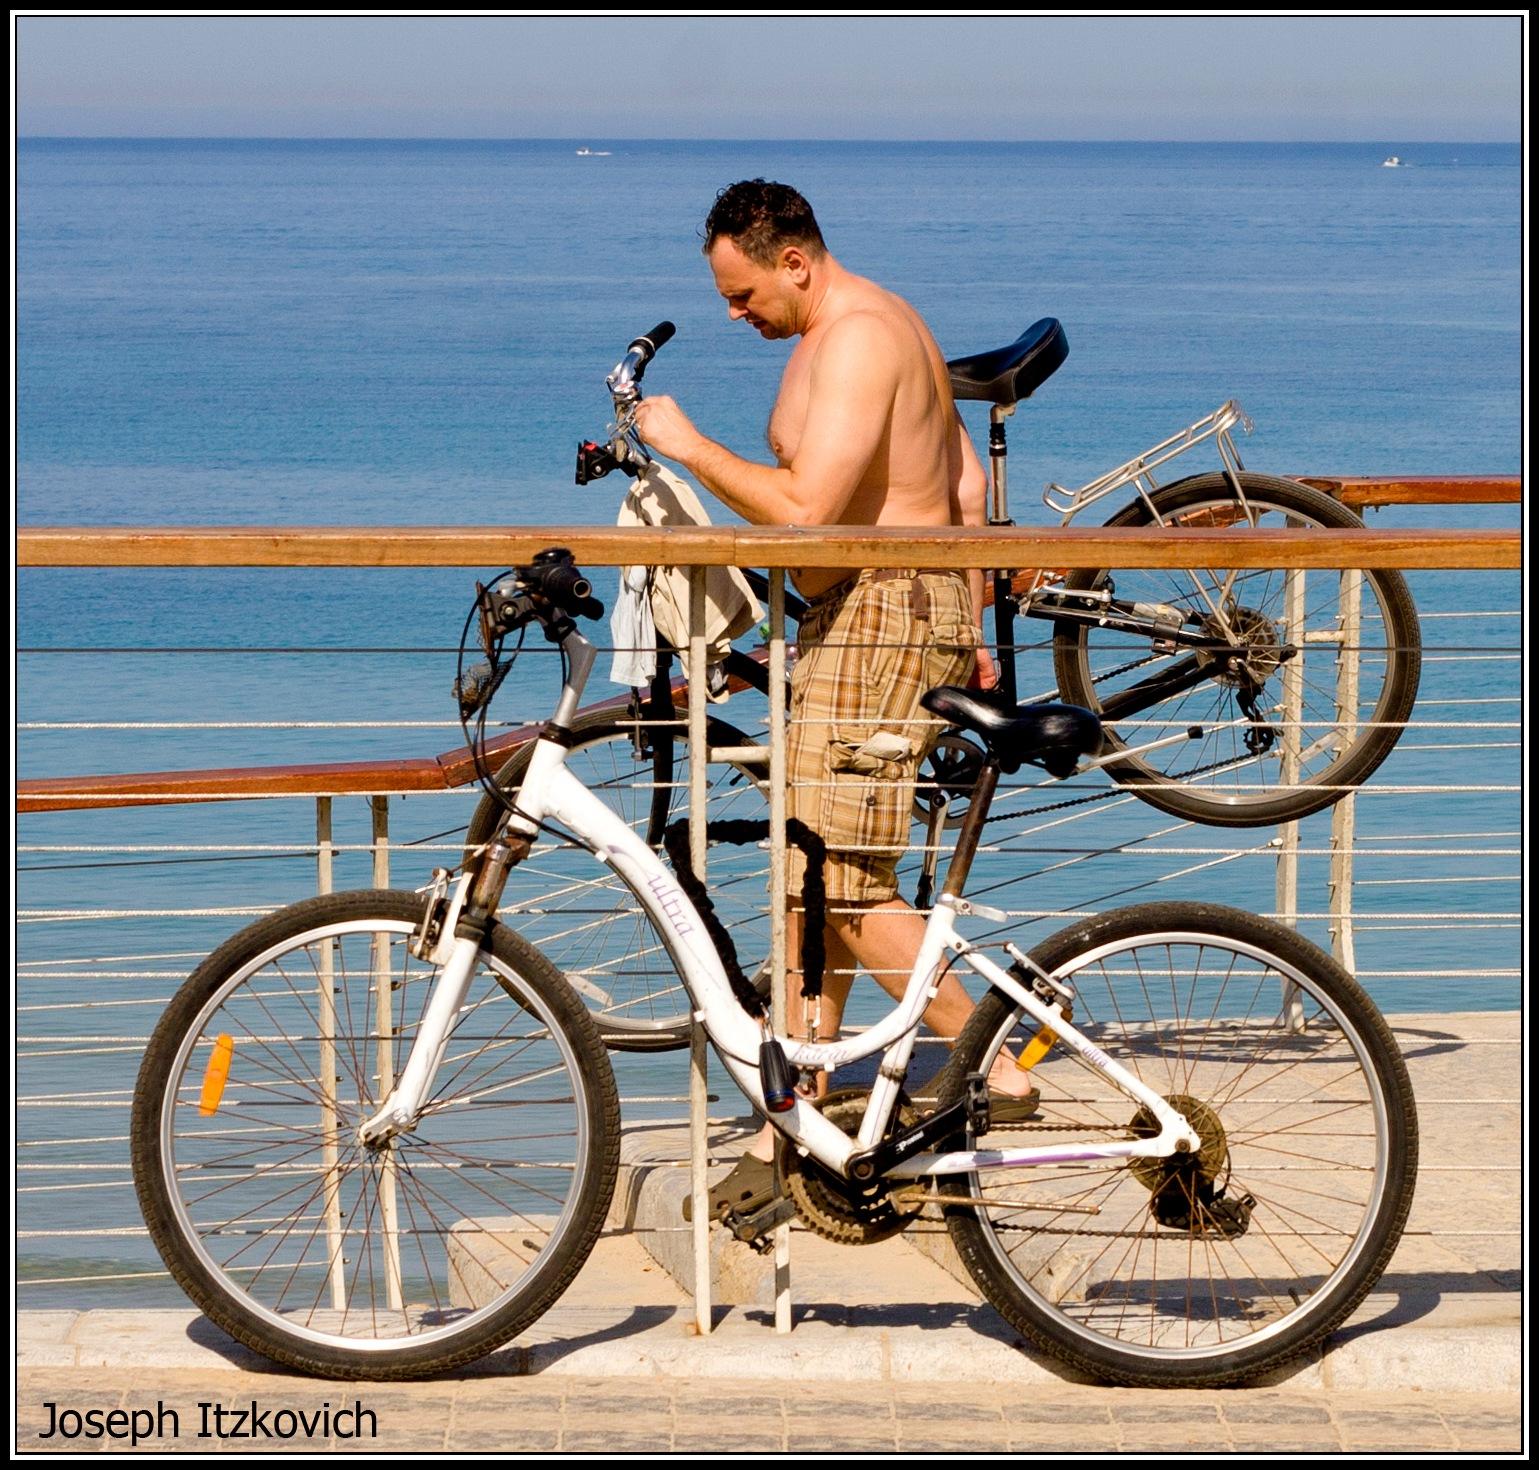 At the beach 1 by  Itzkovich  Joseph